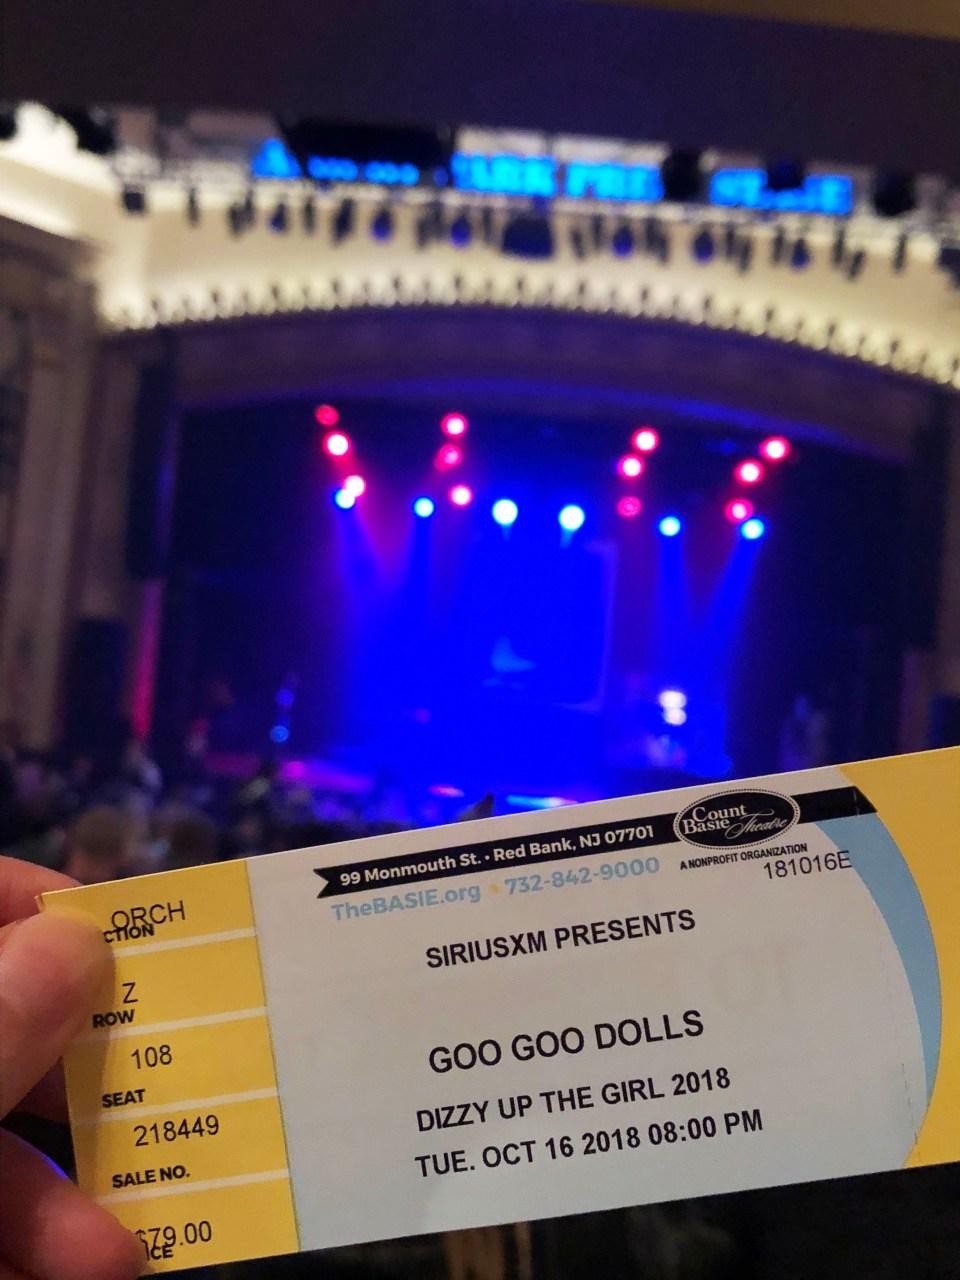 Goo Goo Dolls - Dizzy Up the Girl Anniversary 9